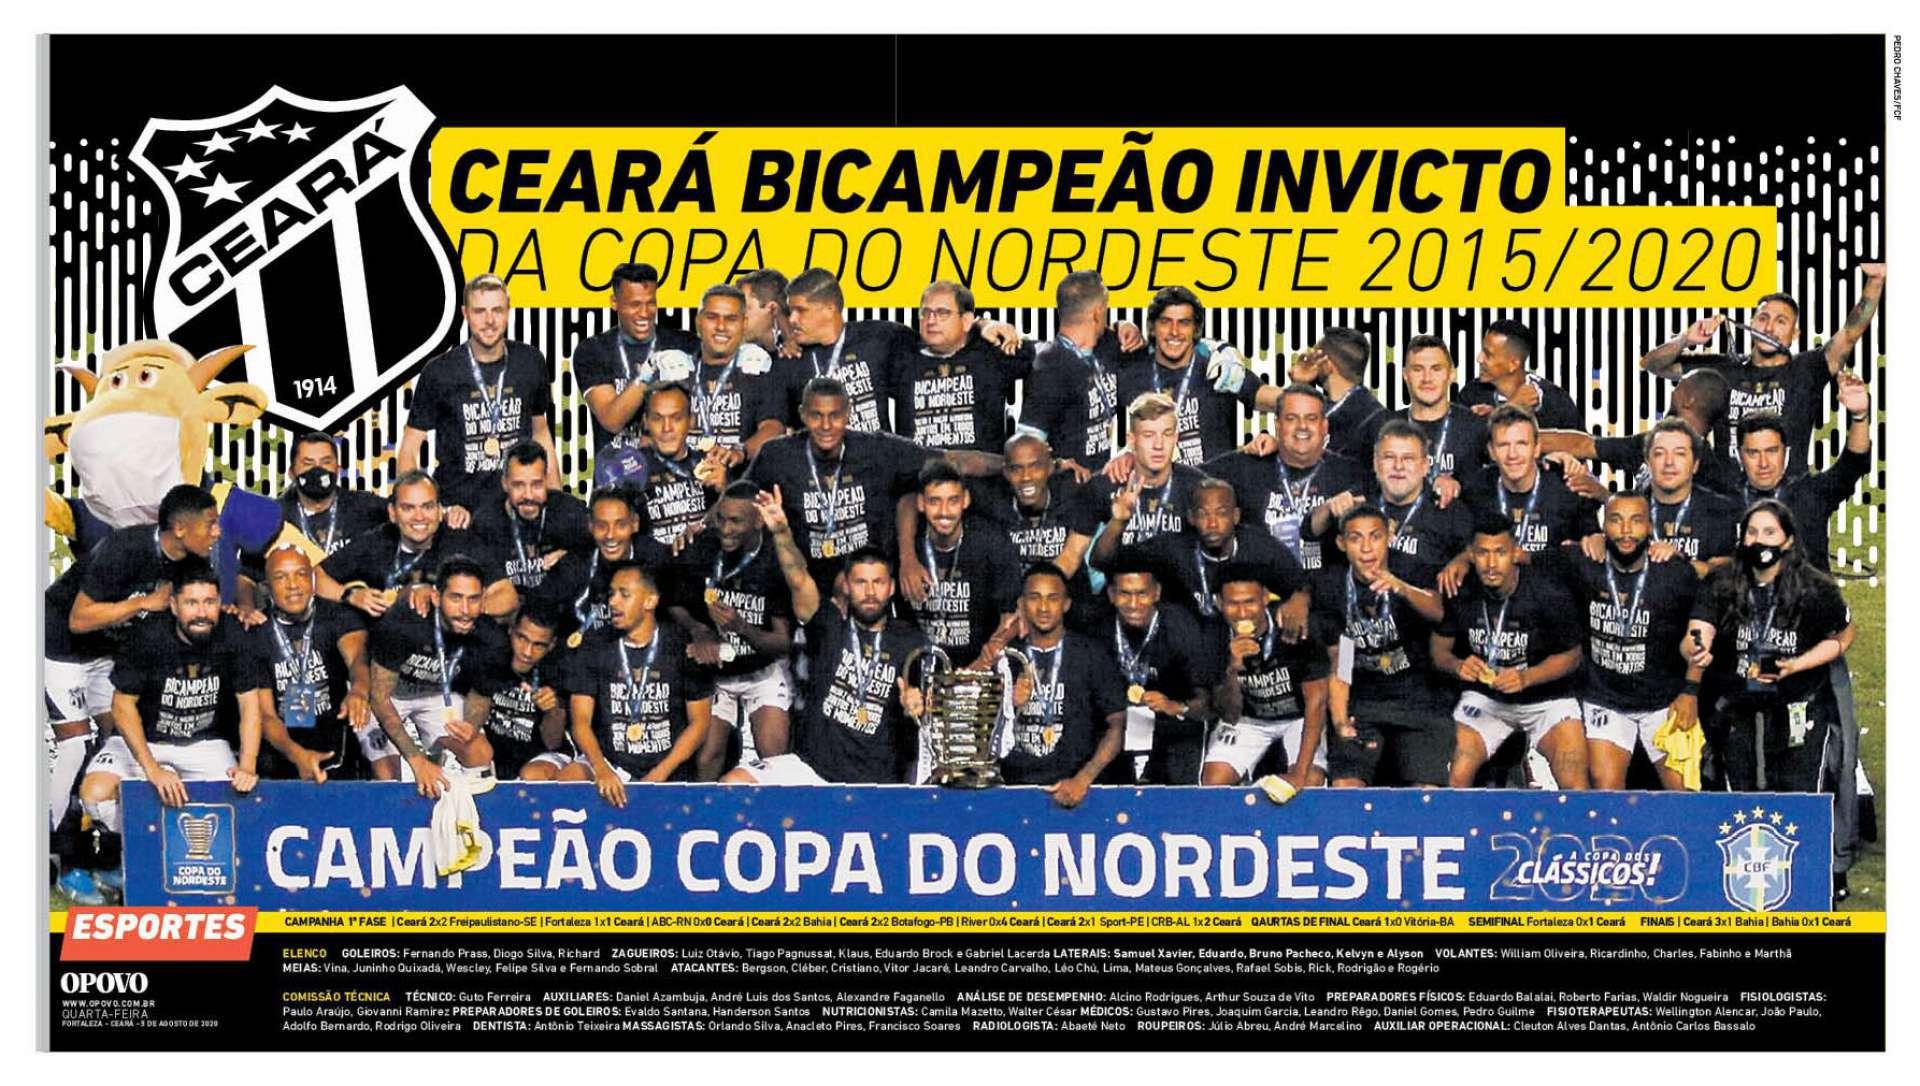 Baixe o pôster do Ceará, campeão da Copa do Nordeste 2020 | Ceará ...